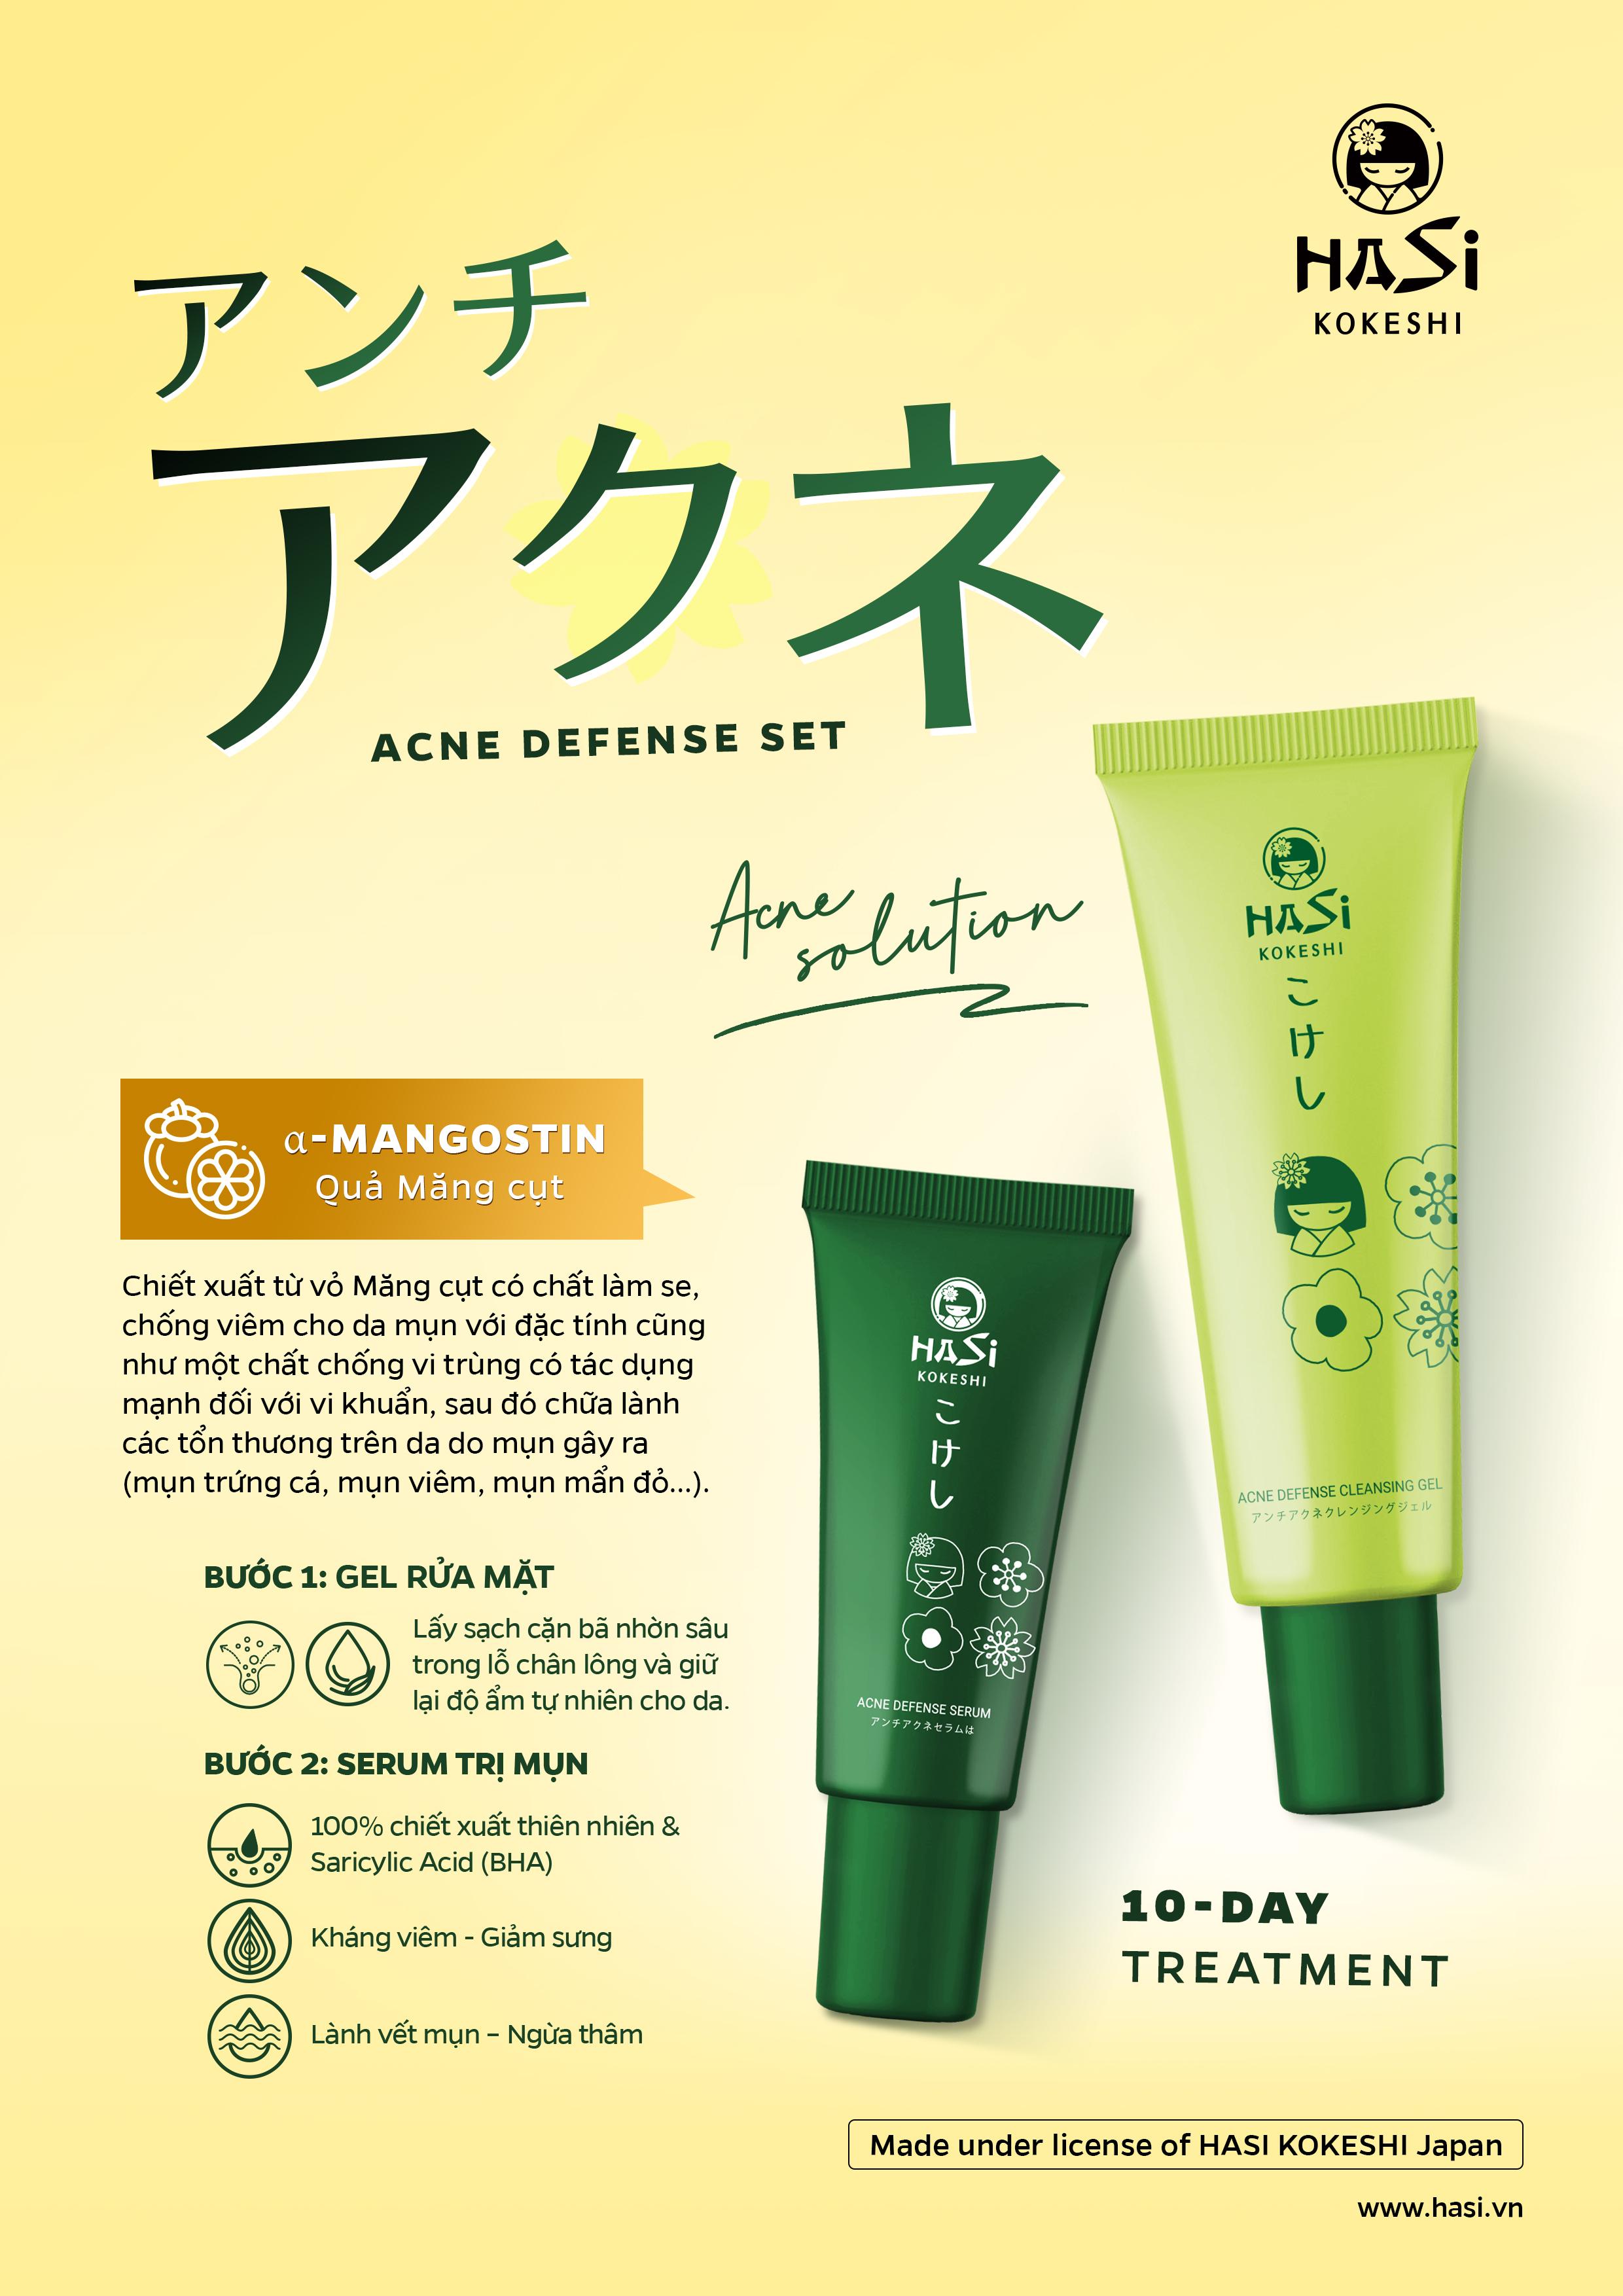 SET DƯỠNG CHO DA MỤN: SERUM & GEL RỬA MẶT - HASI KOKESHI ACNE DEFENCE SET (HSK 014)